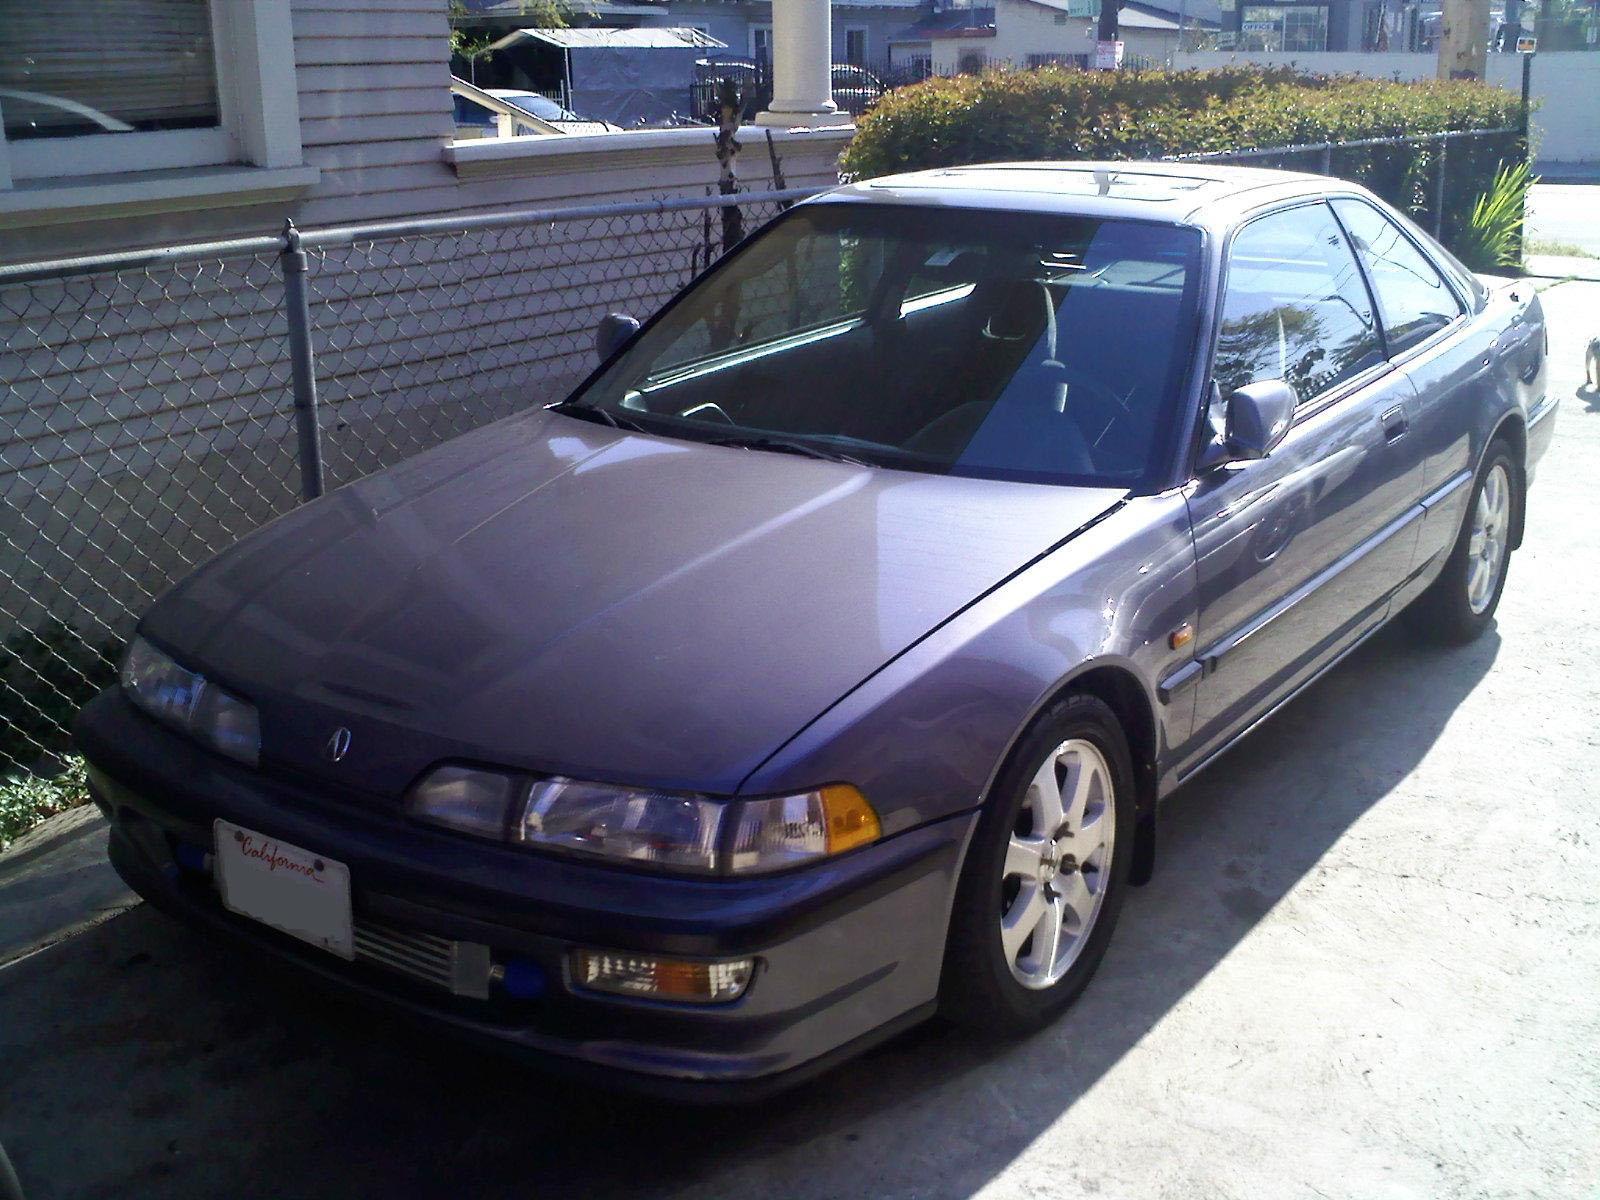 Acura Honda Integra Integra LS For Sale Lincoln Heights - Honda acura for sale